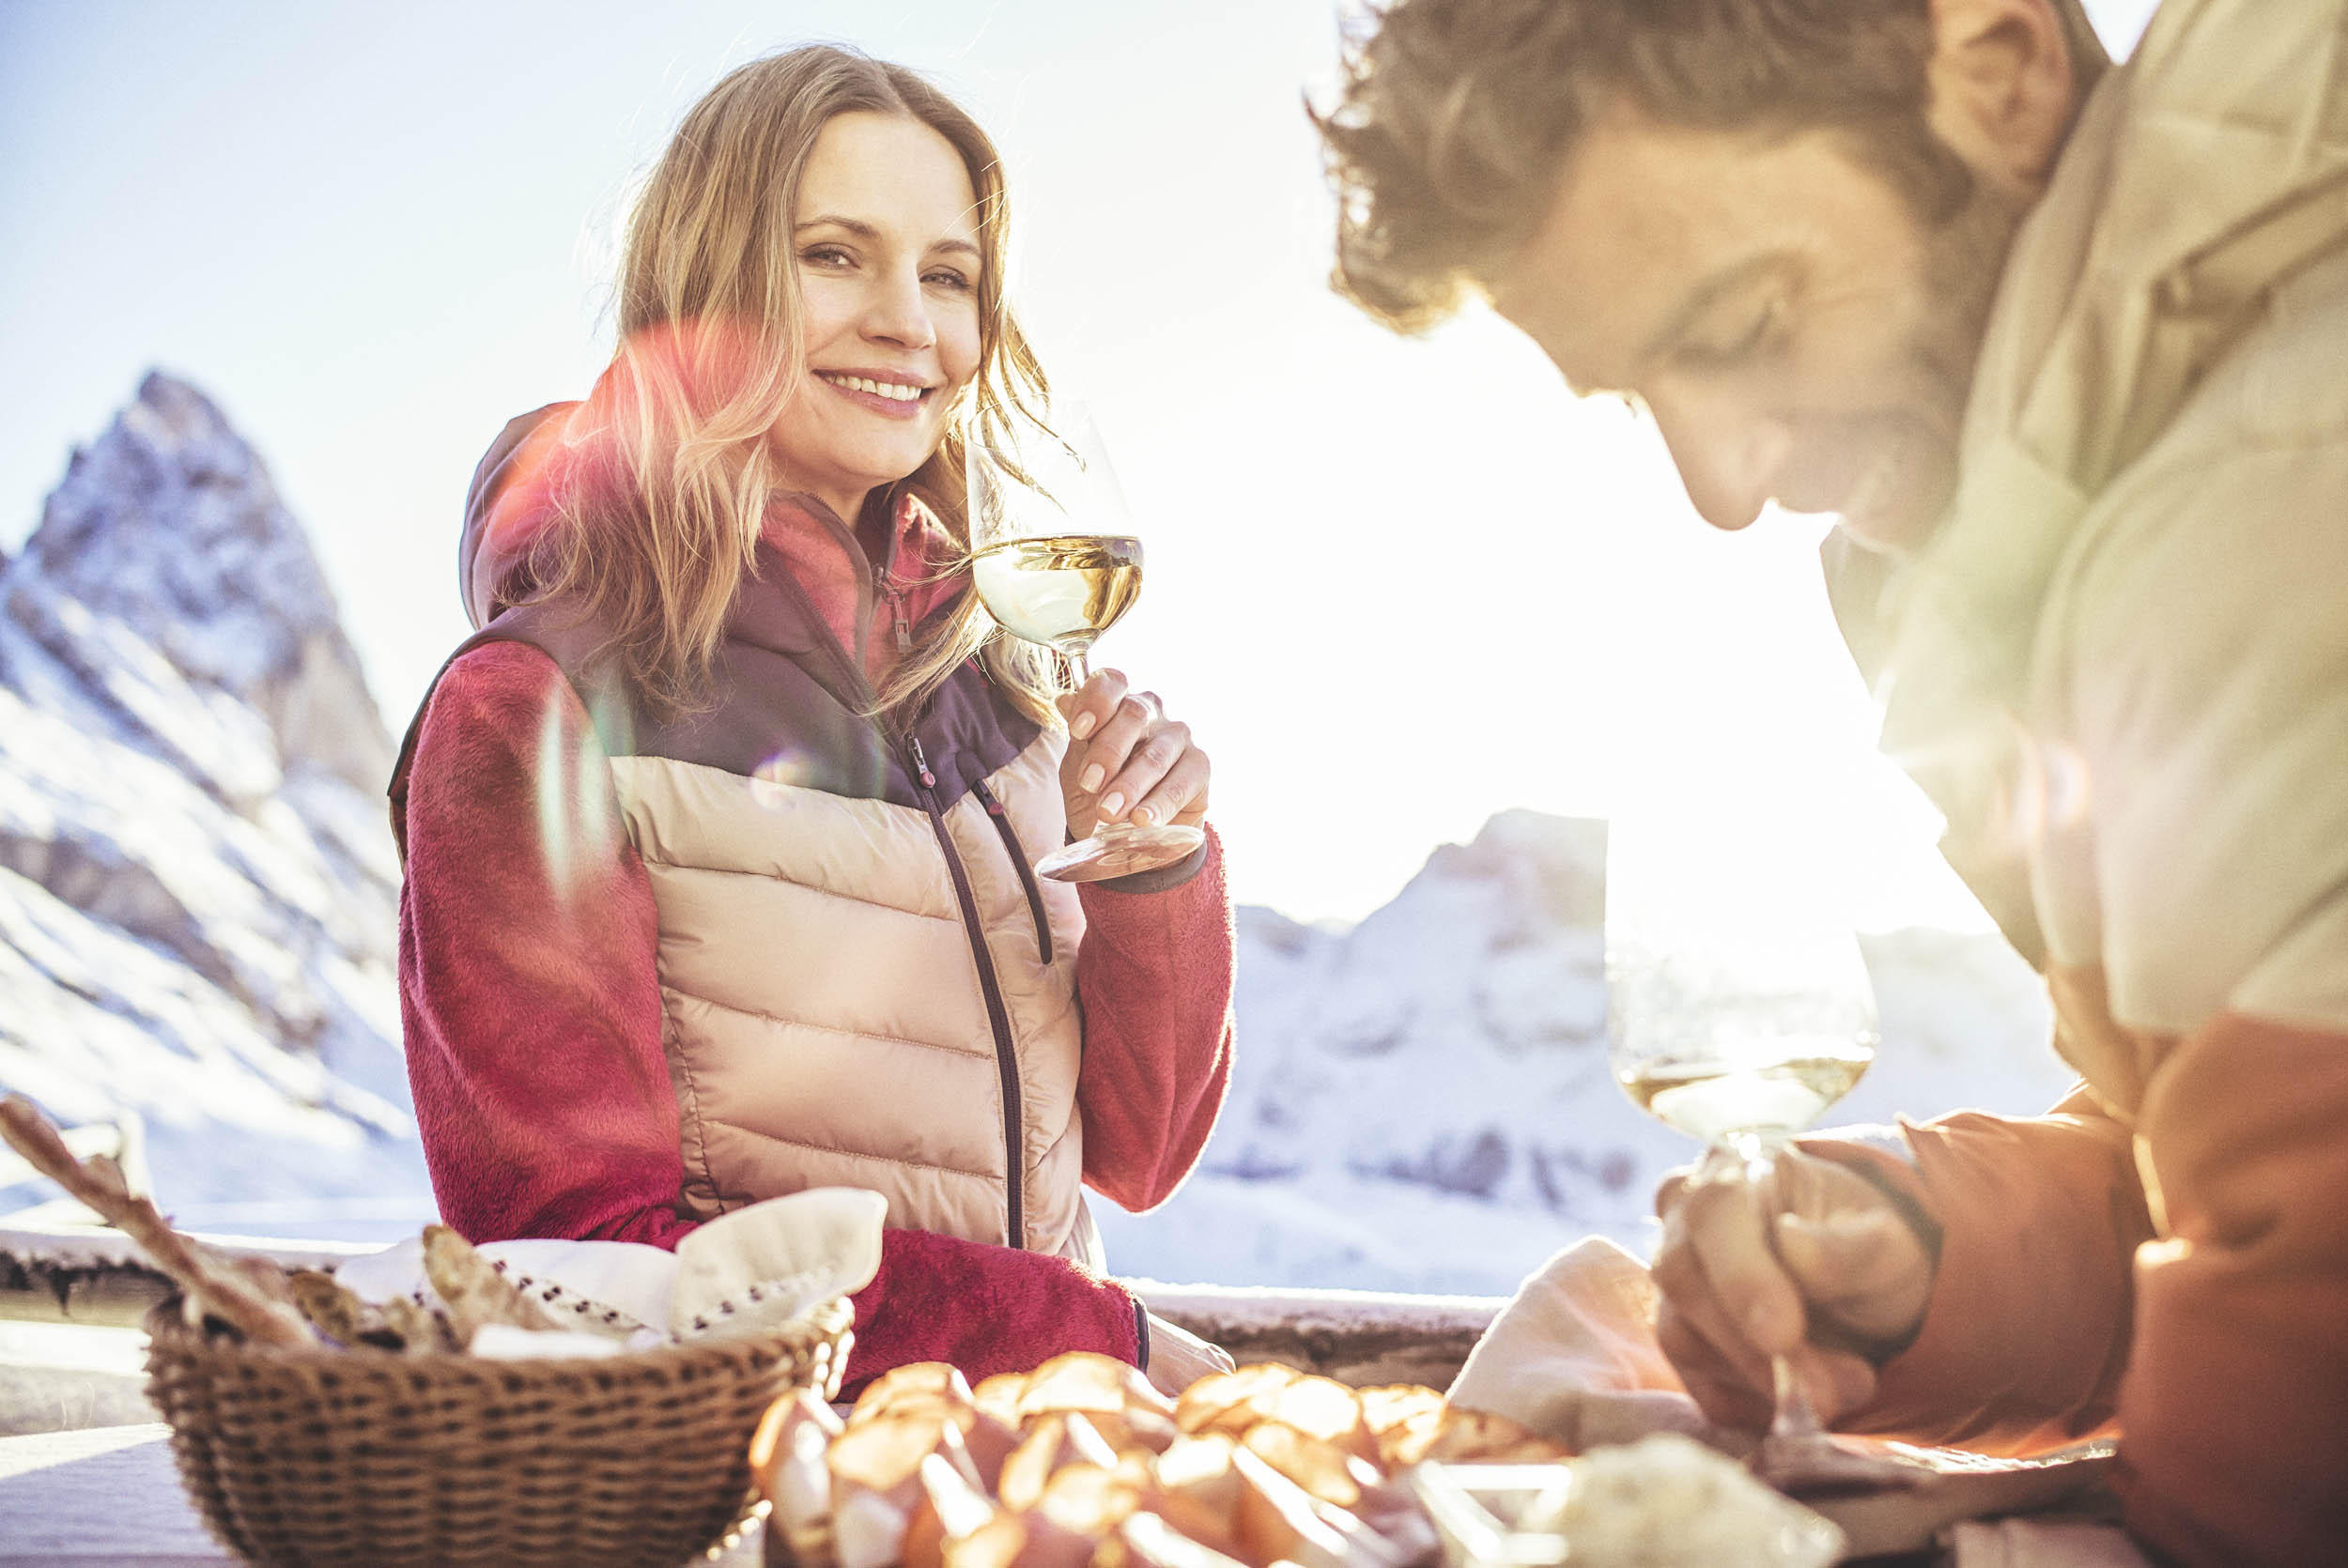 seifertuebler-lifestyle-suedtirol-winter-tourism-ski-dolomites04.jpg